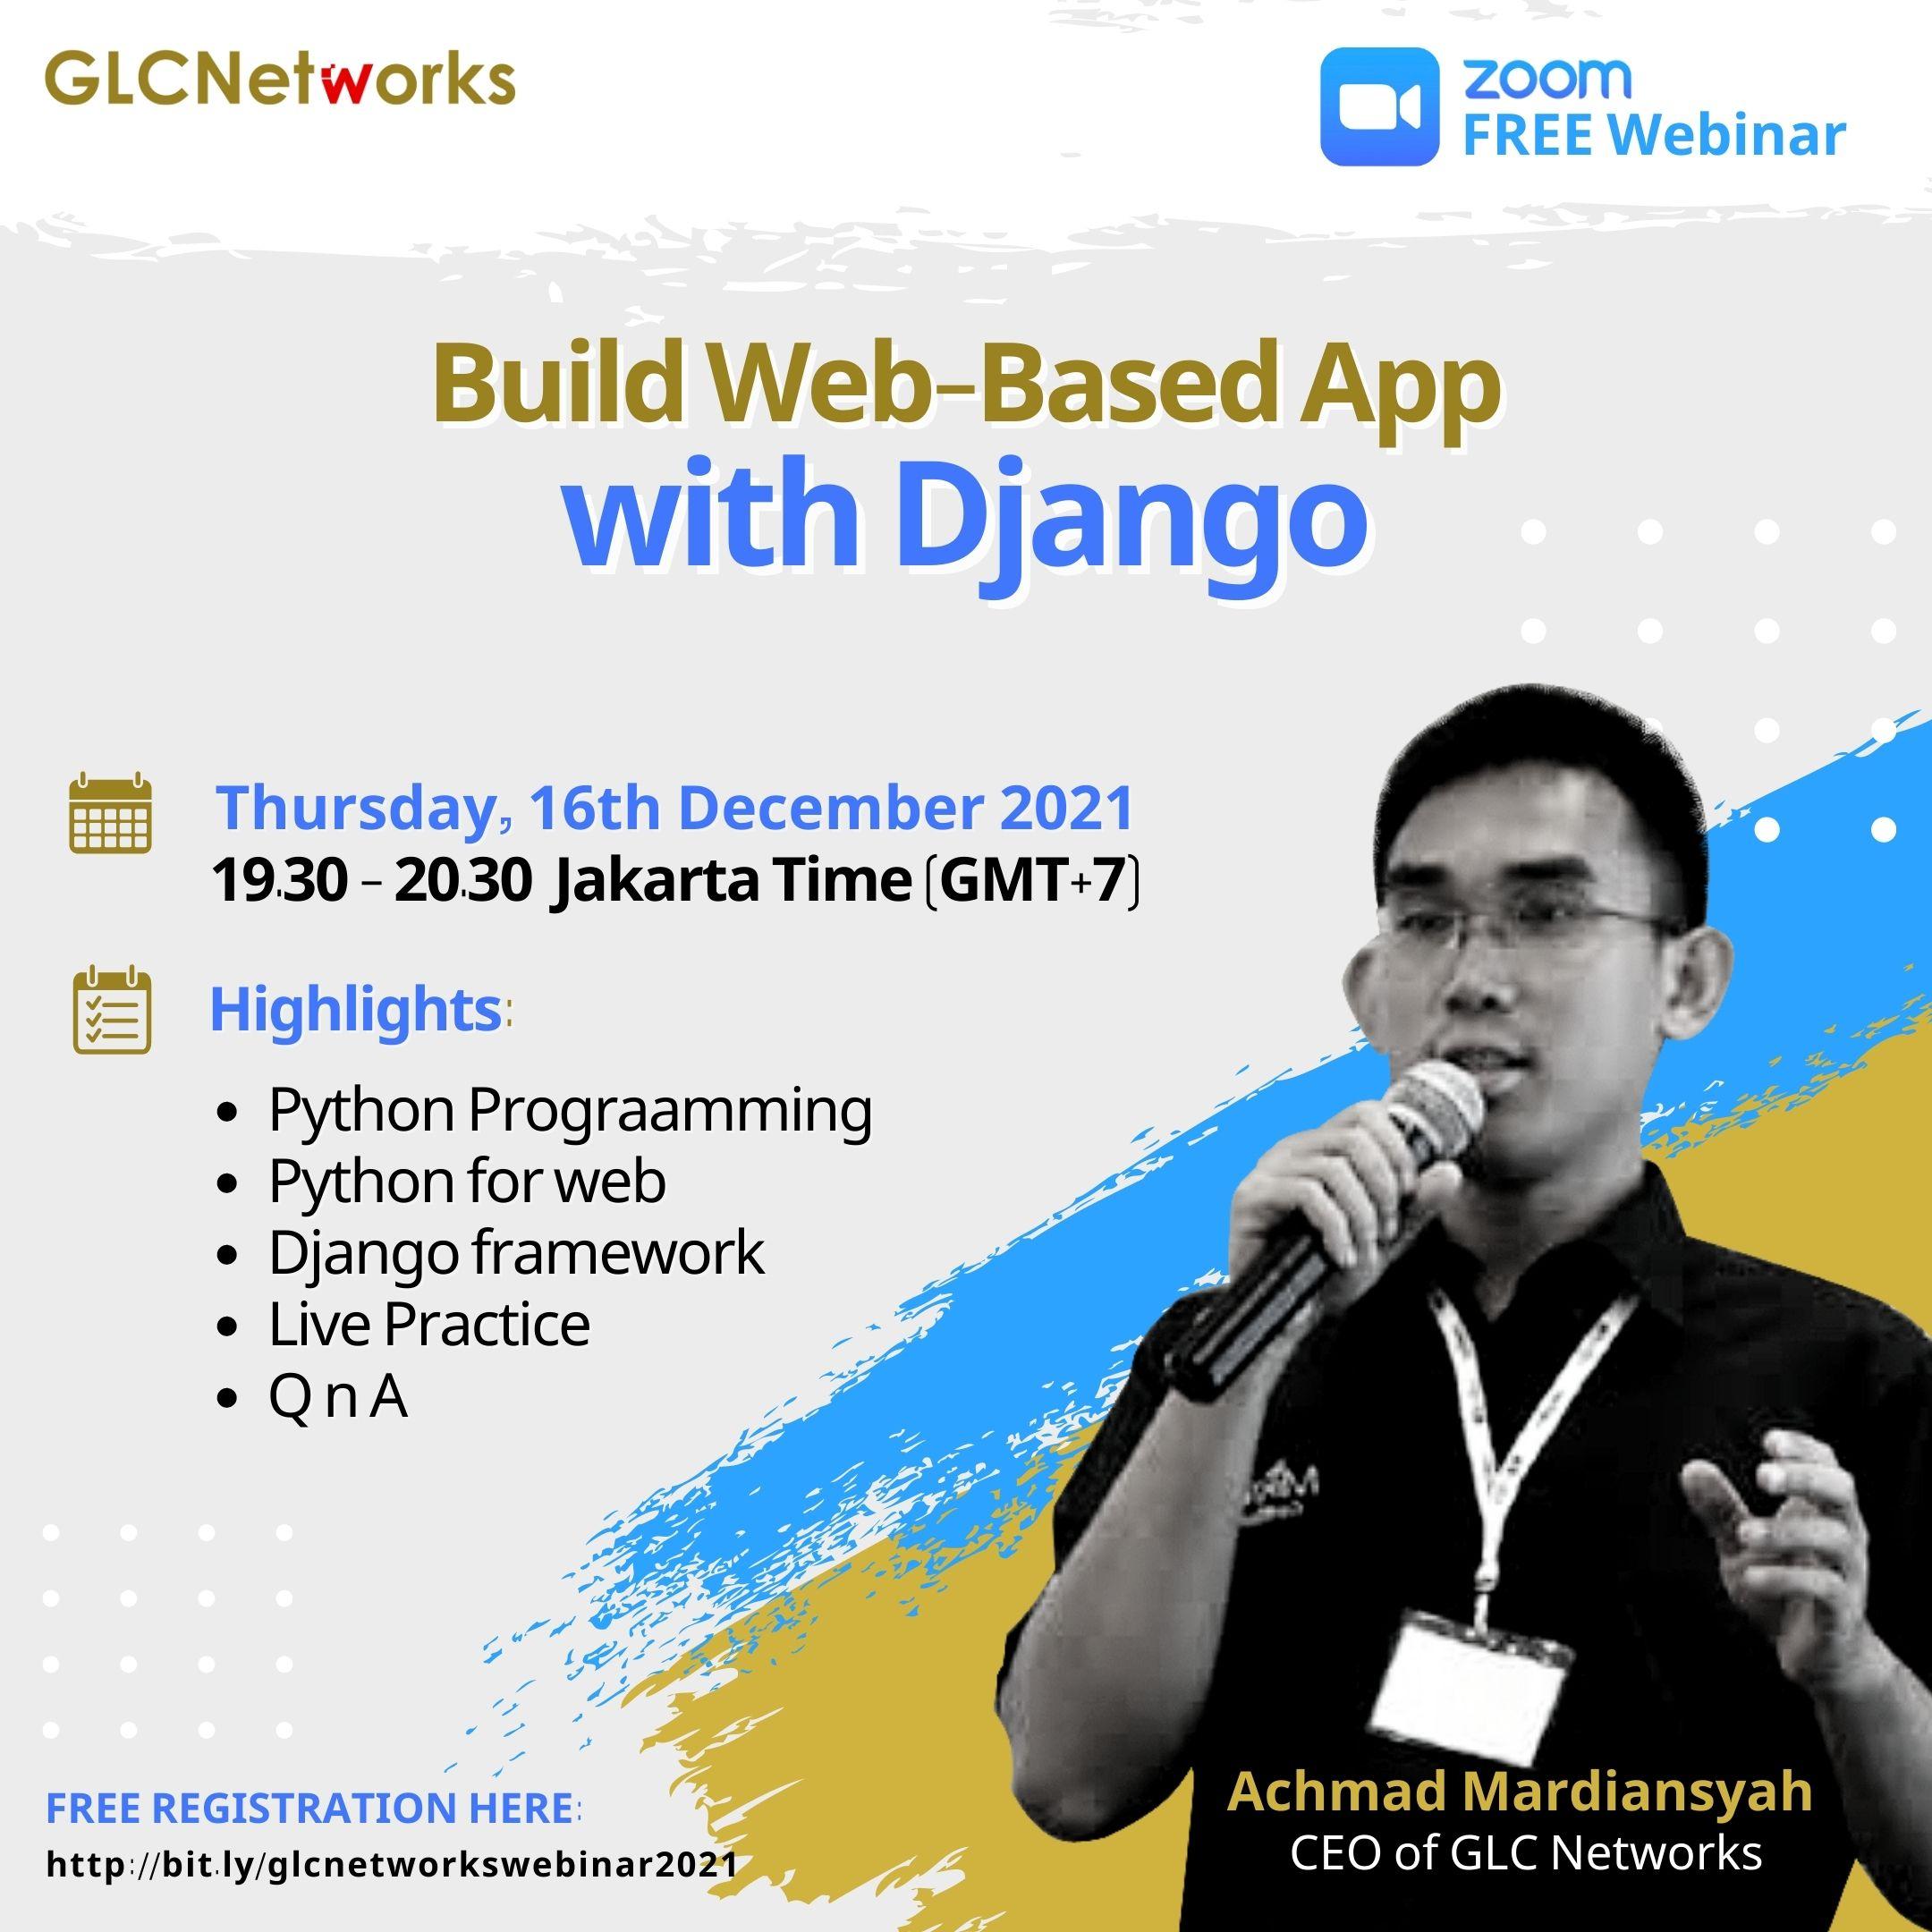 Build Web-Based App with Django